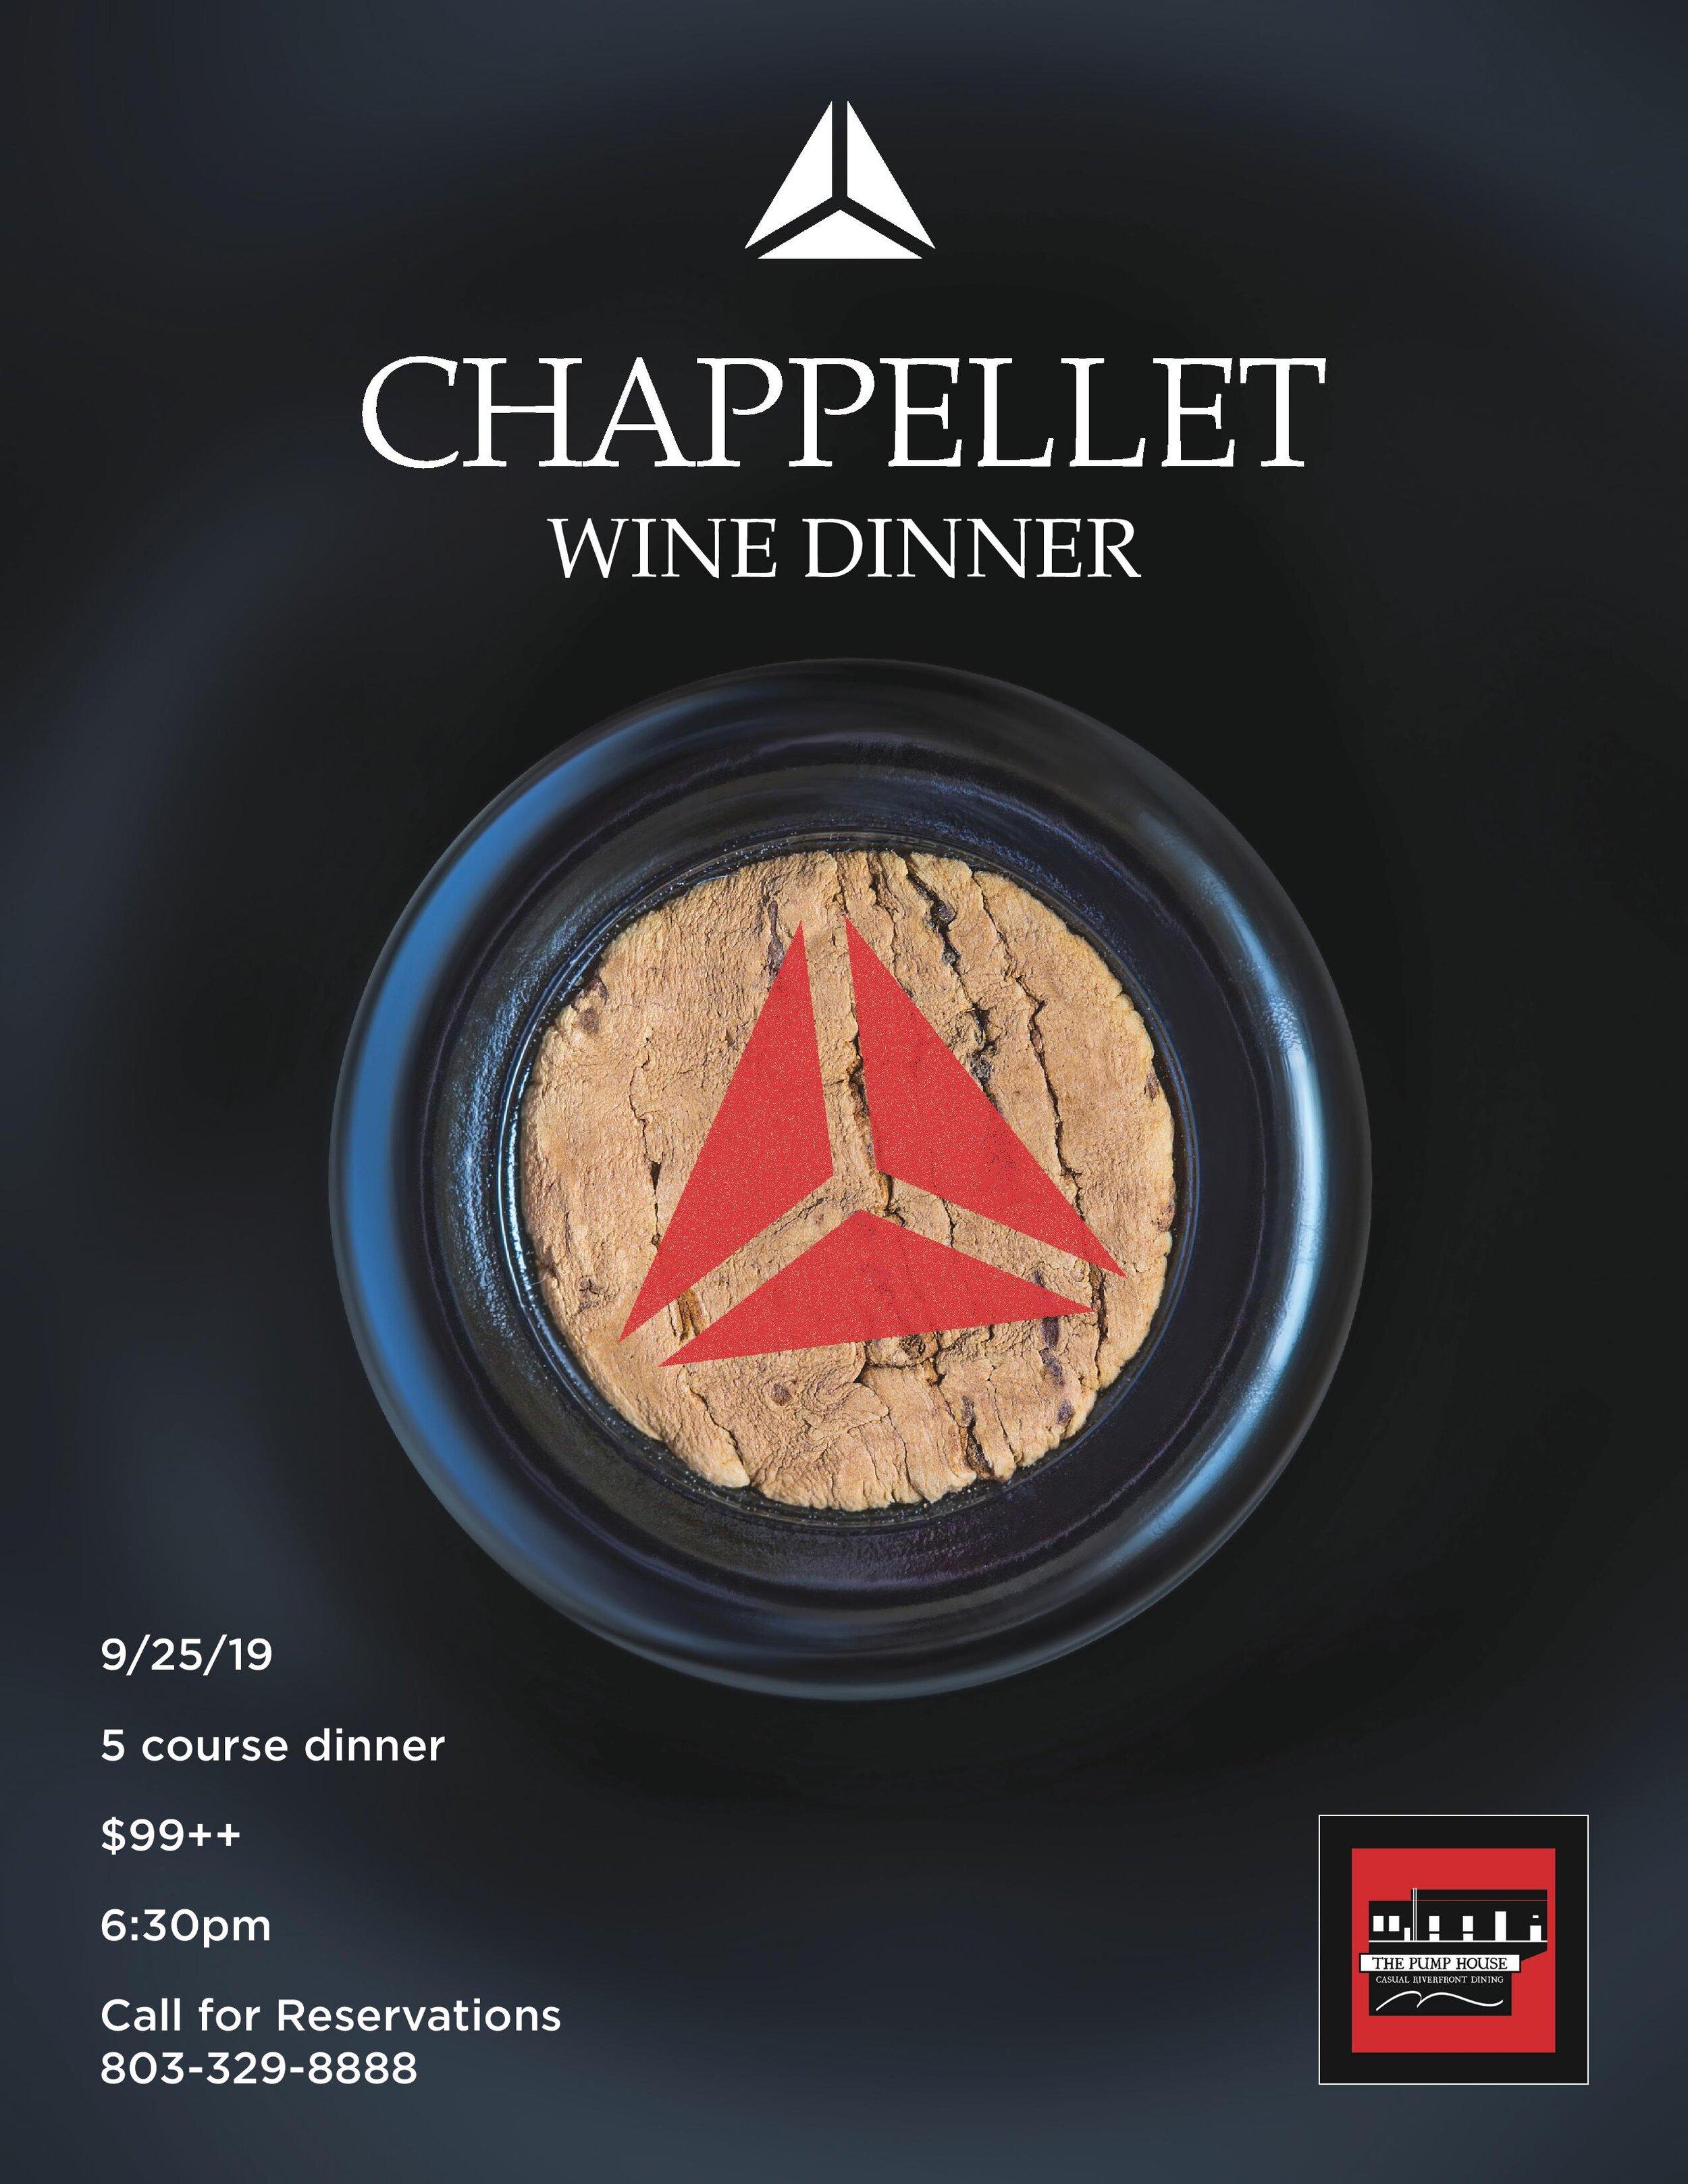 Chappellet_WineDinner_WebGraphic_FIN-page-001.jpg